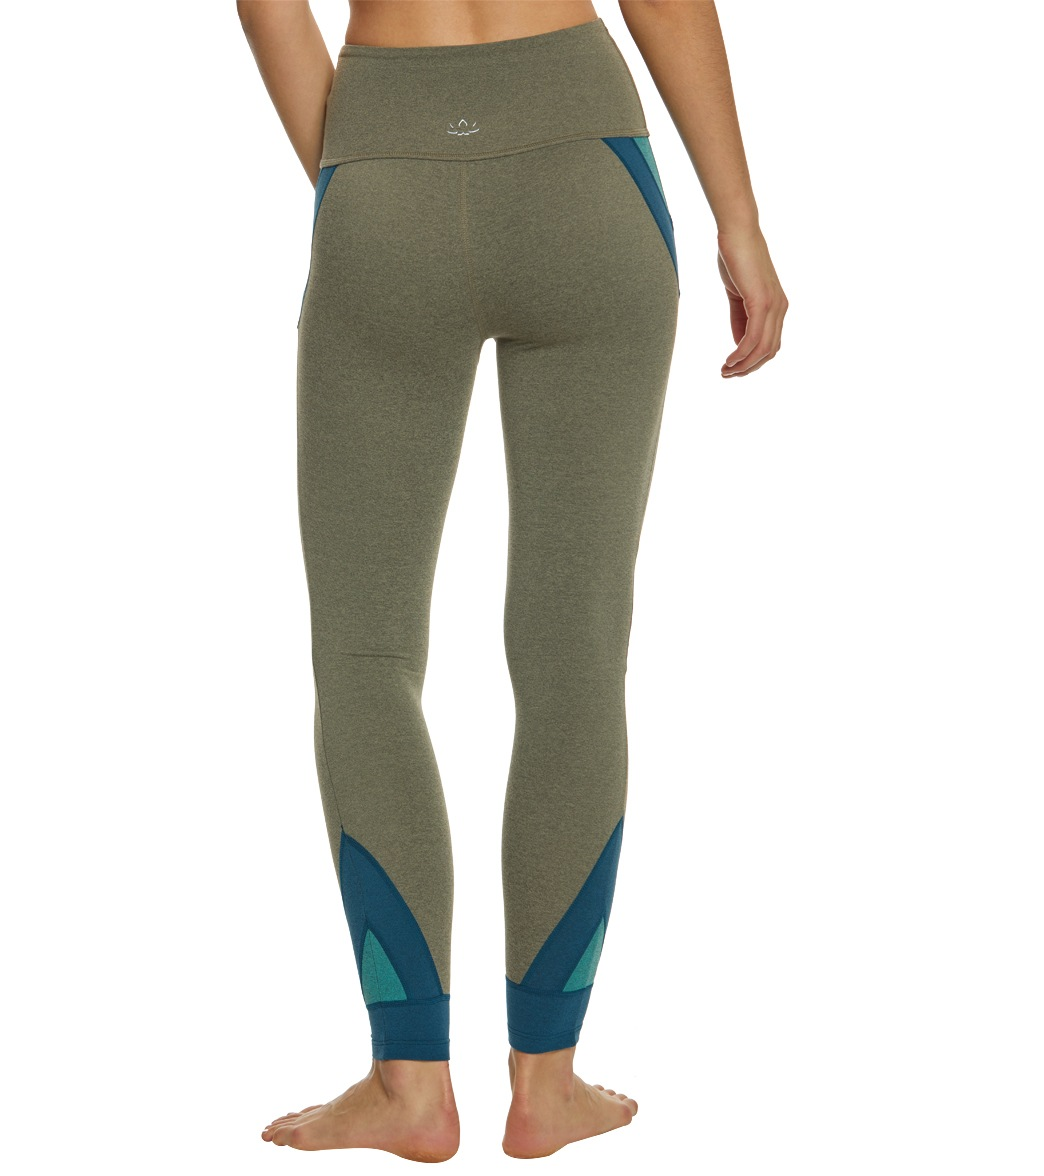 0dc047c02b Beyond Yoga Block And Key High Waisted Midi Yoga Leggings at ...